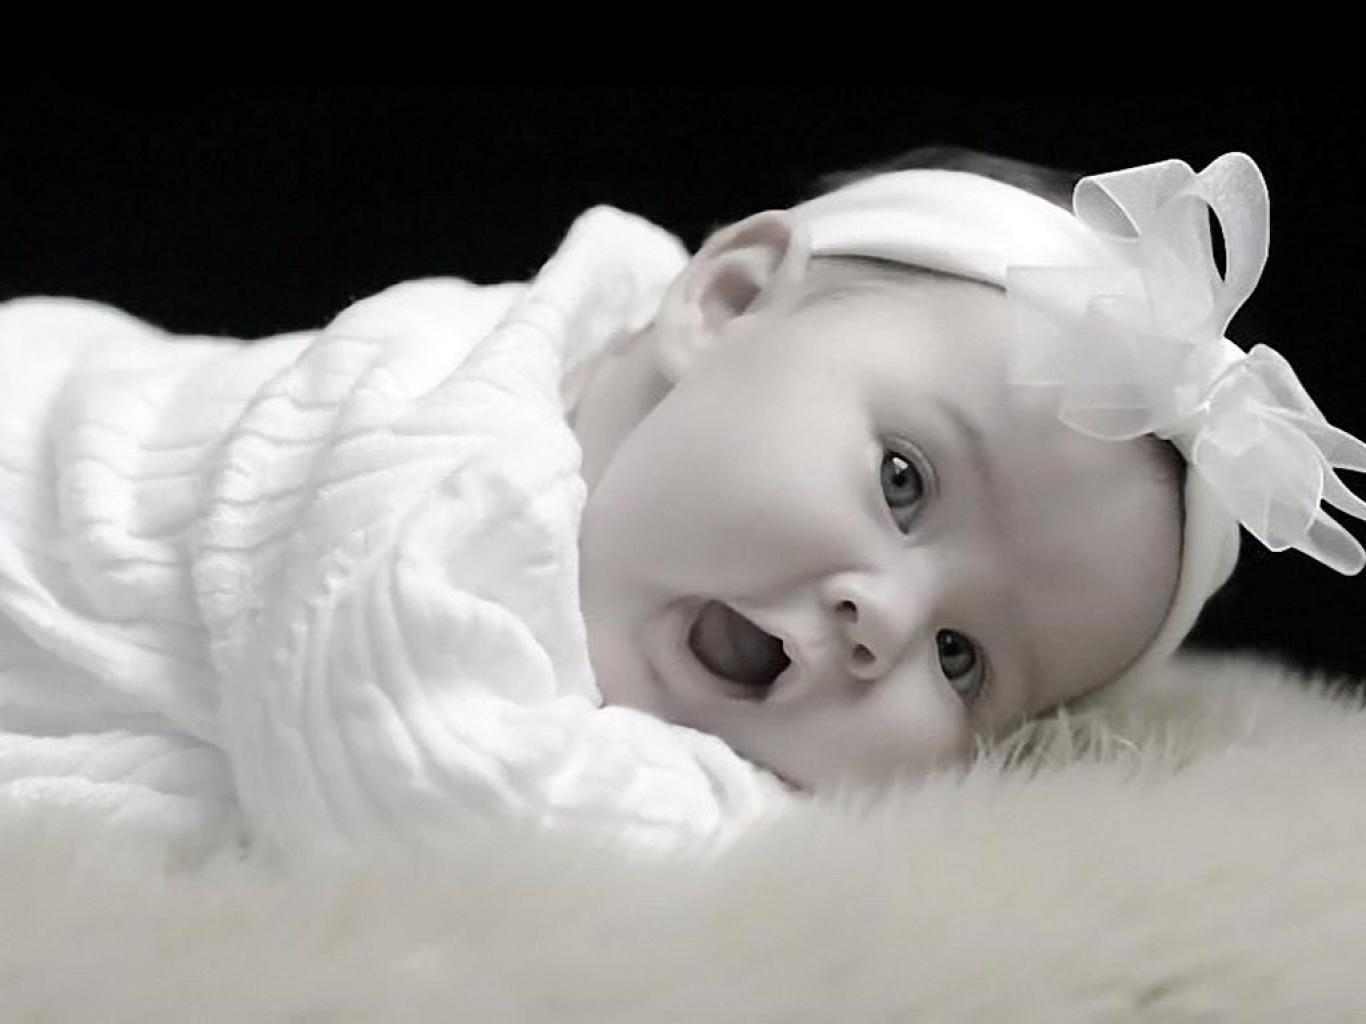 Gambar Bayi Imut Banget Foto Gambar Terbaru